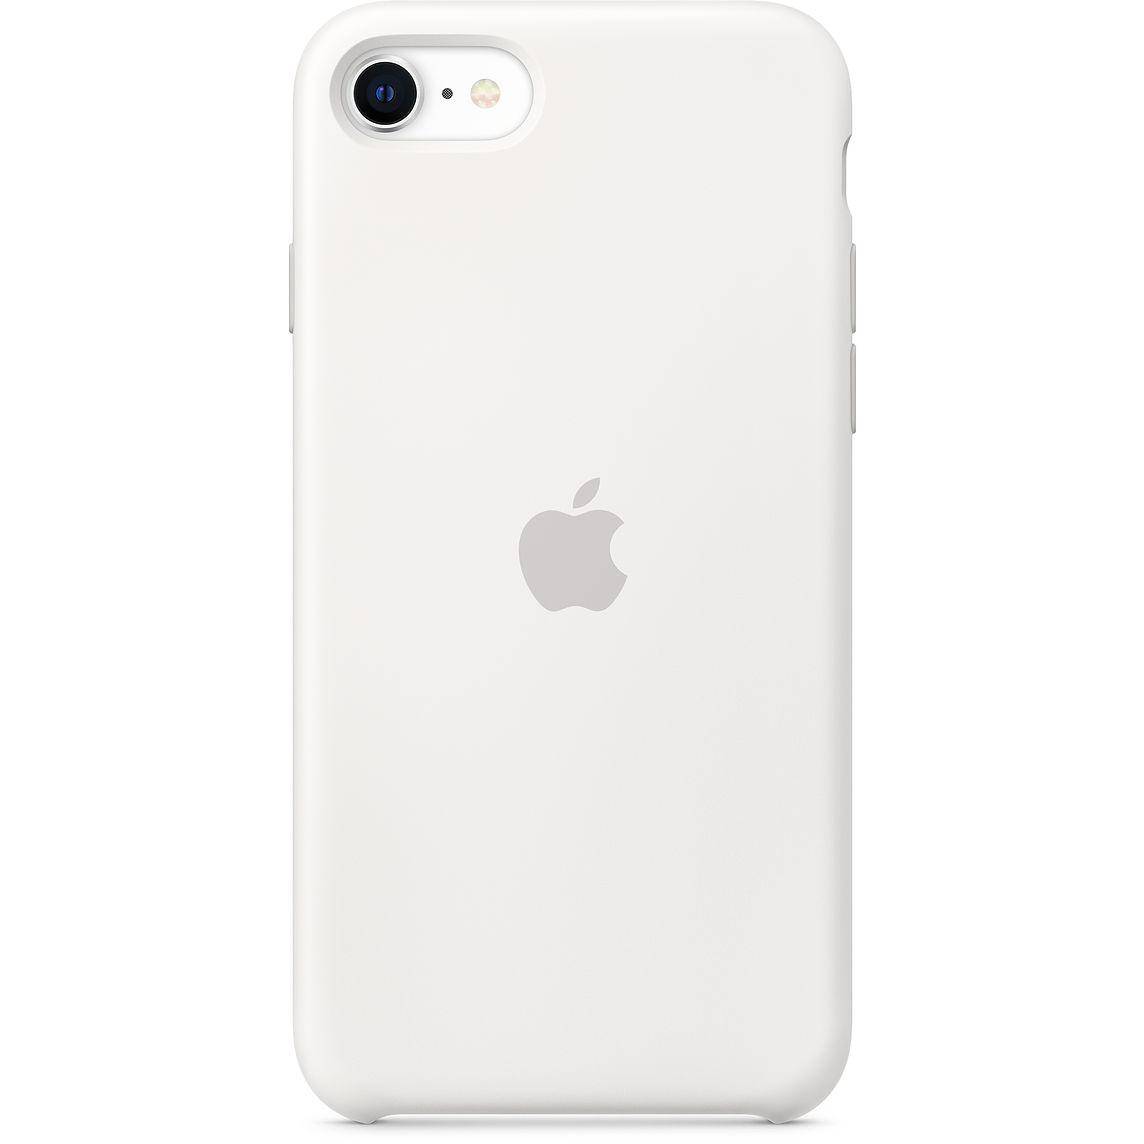 Apple iPhone SE Silicone Case White (2020)